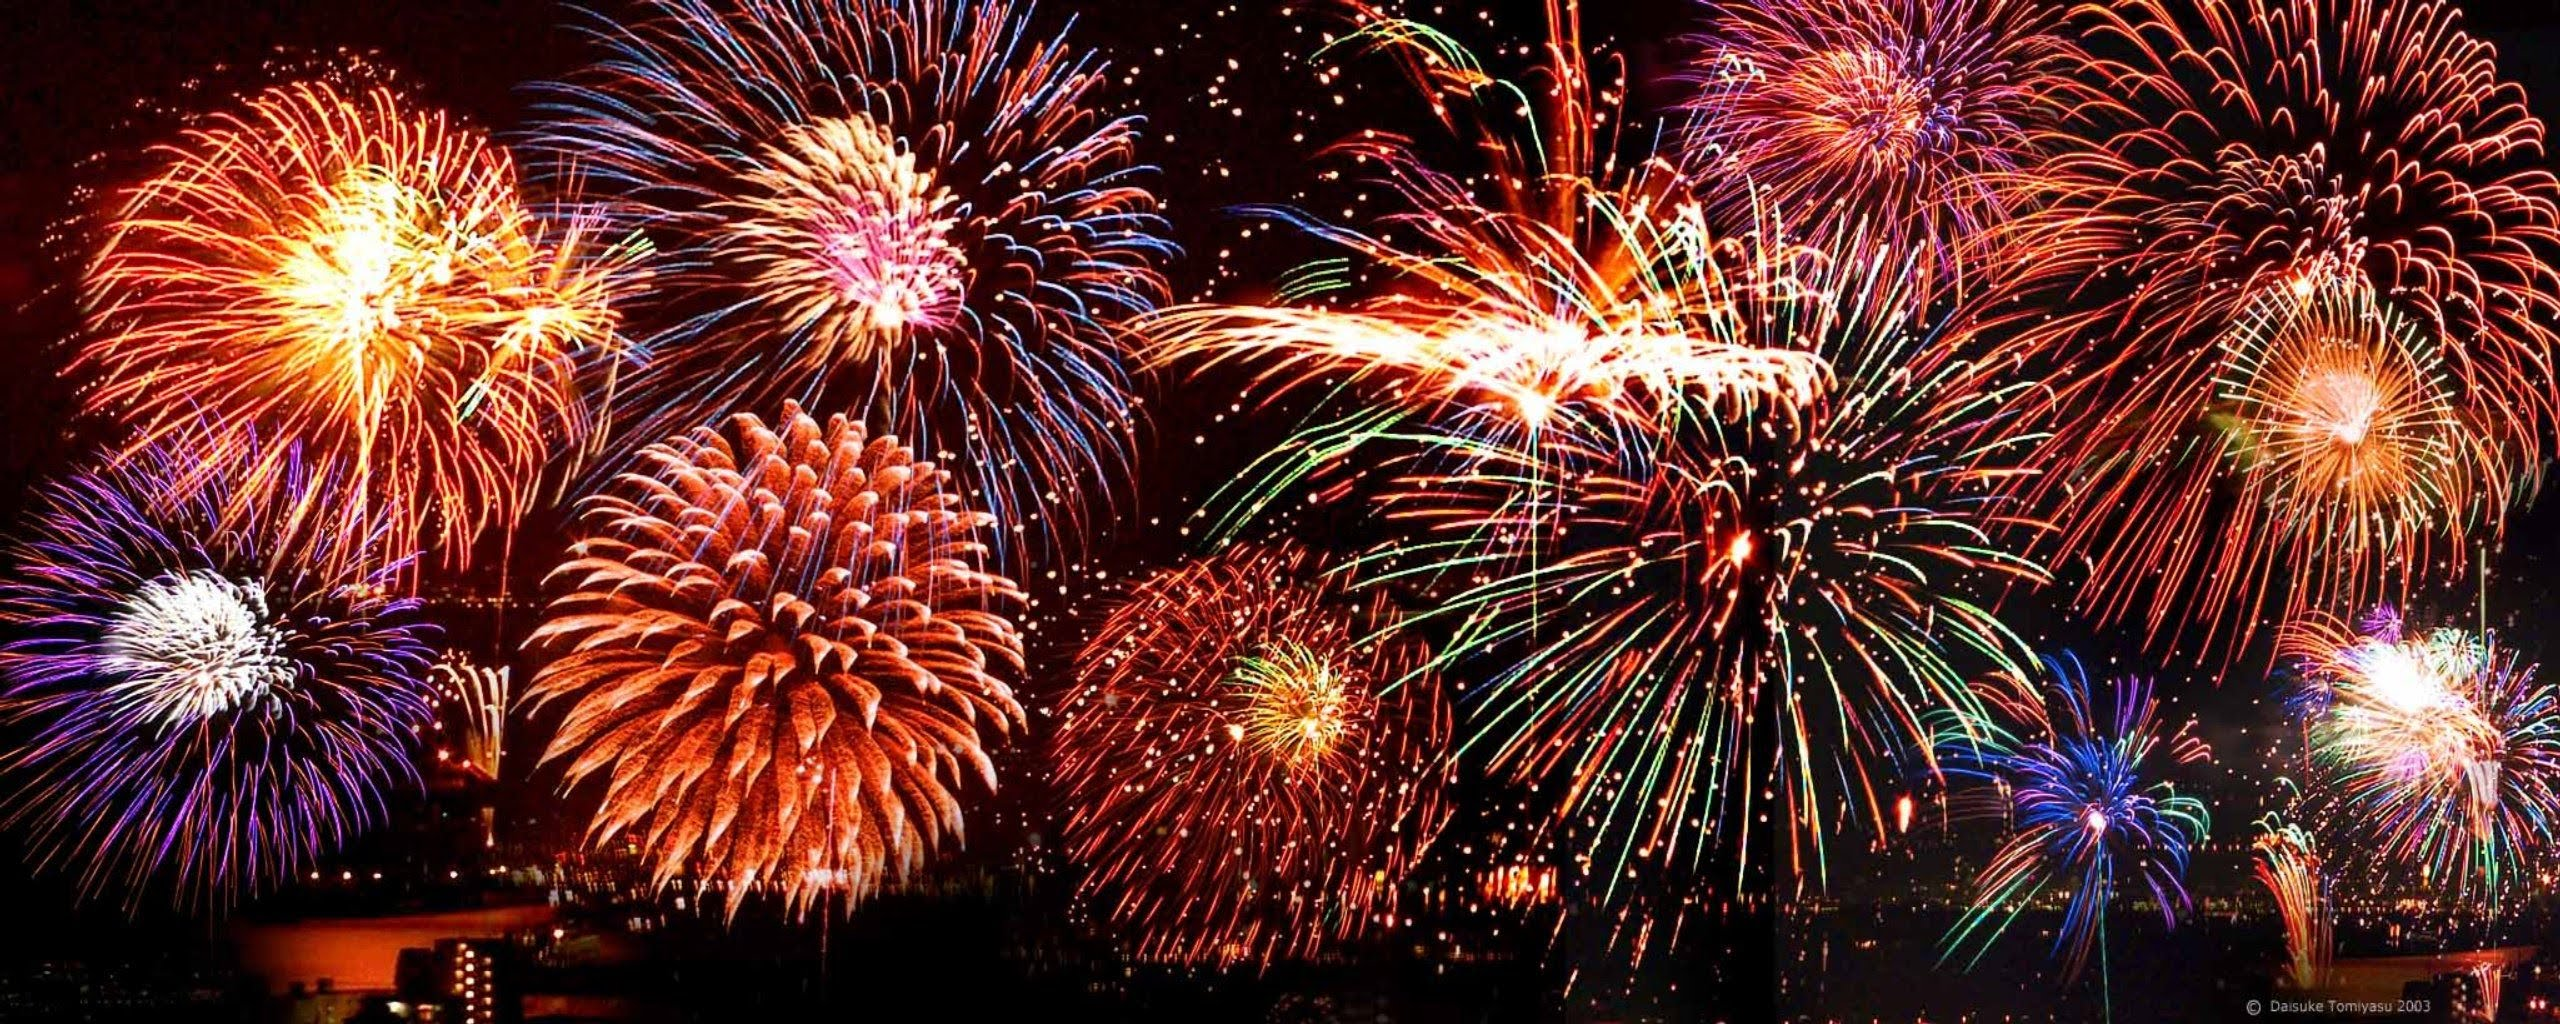 Oulton Park Fireworks Display 2015 - YouTube